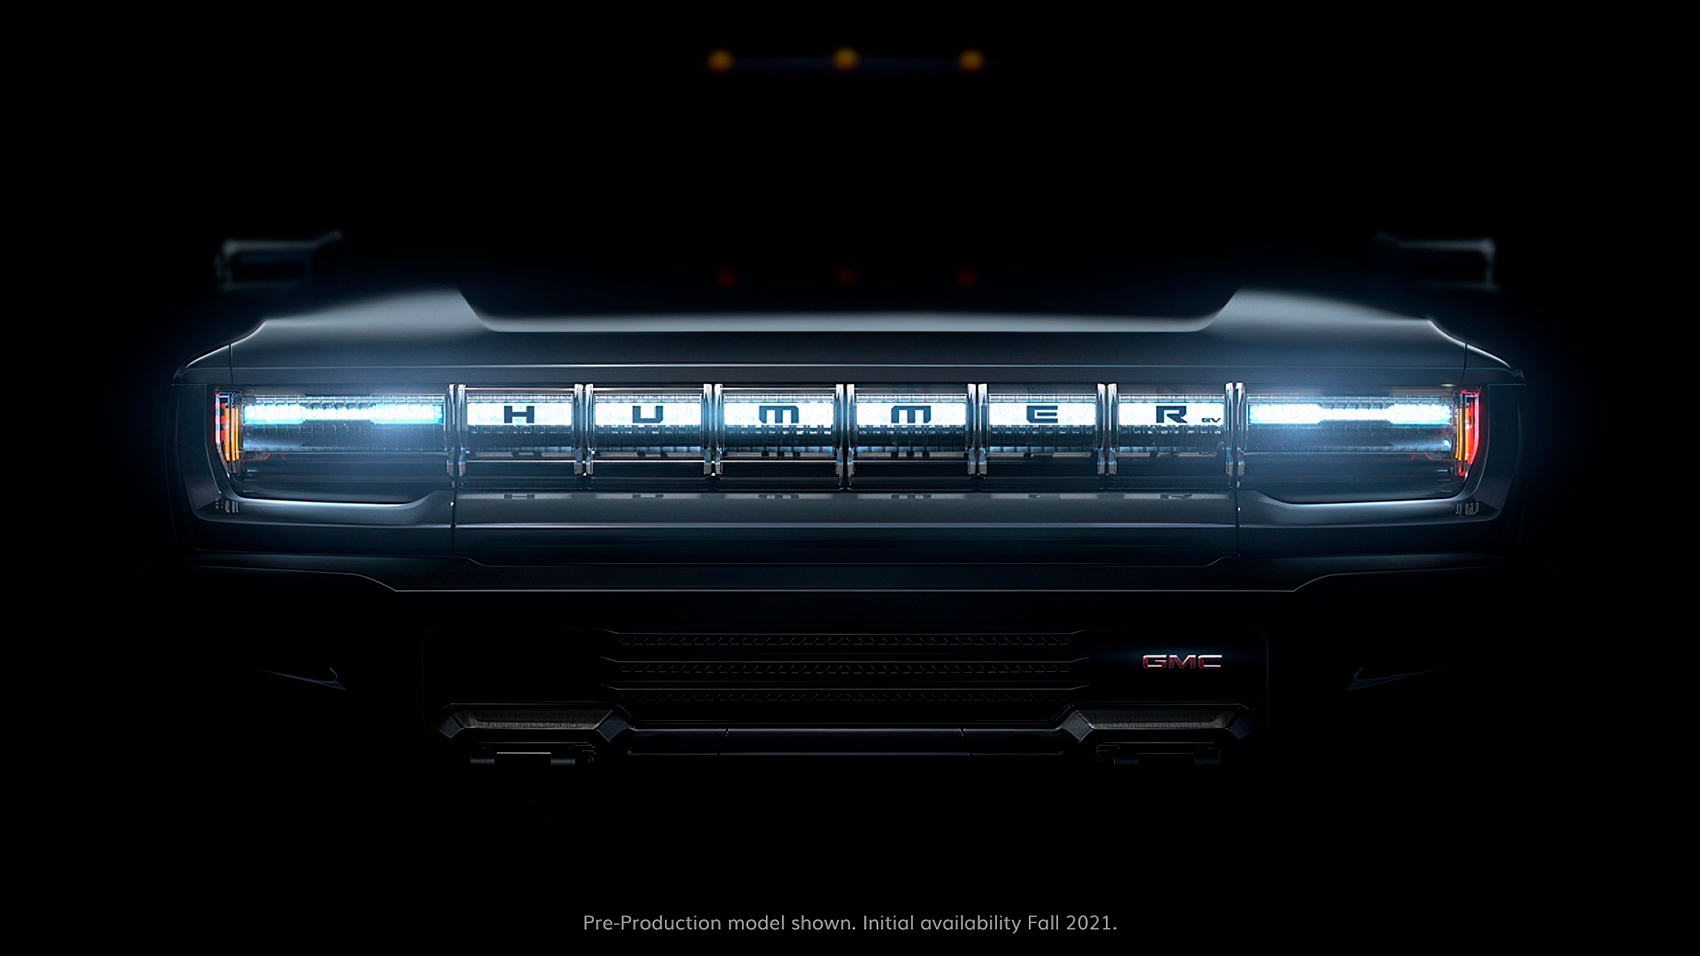 Her er det eneste bildet GMC har vist rundt den kommende elbilen Hummer EV. (Foto: GM)